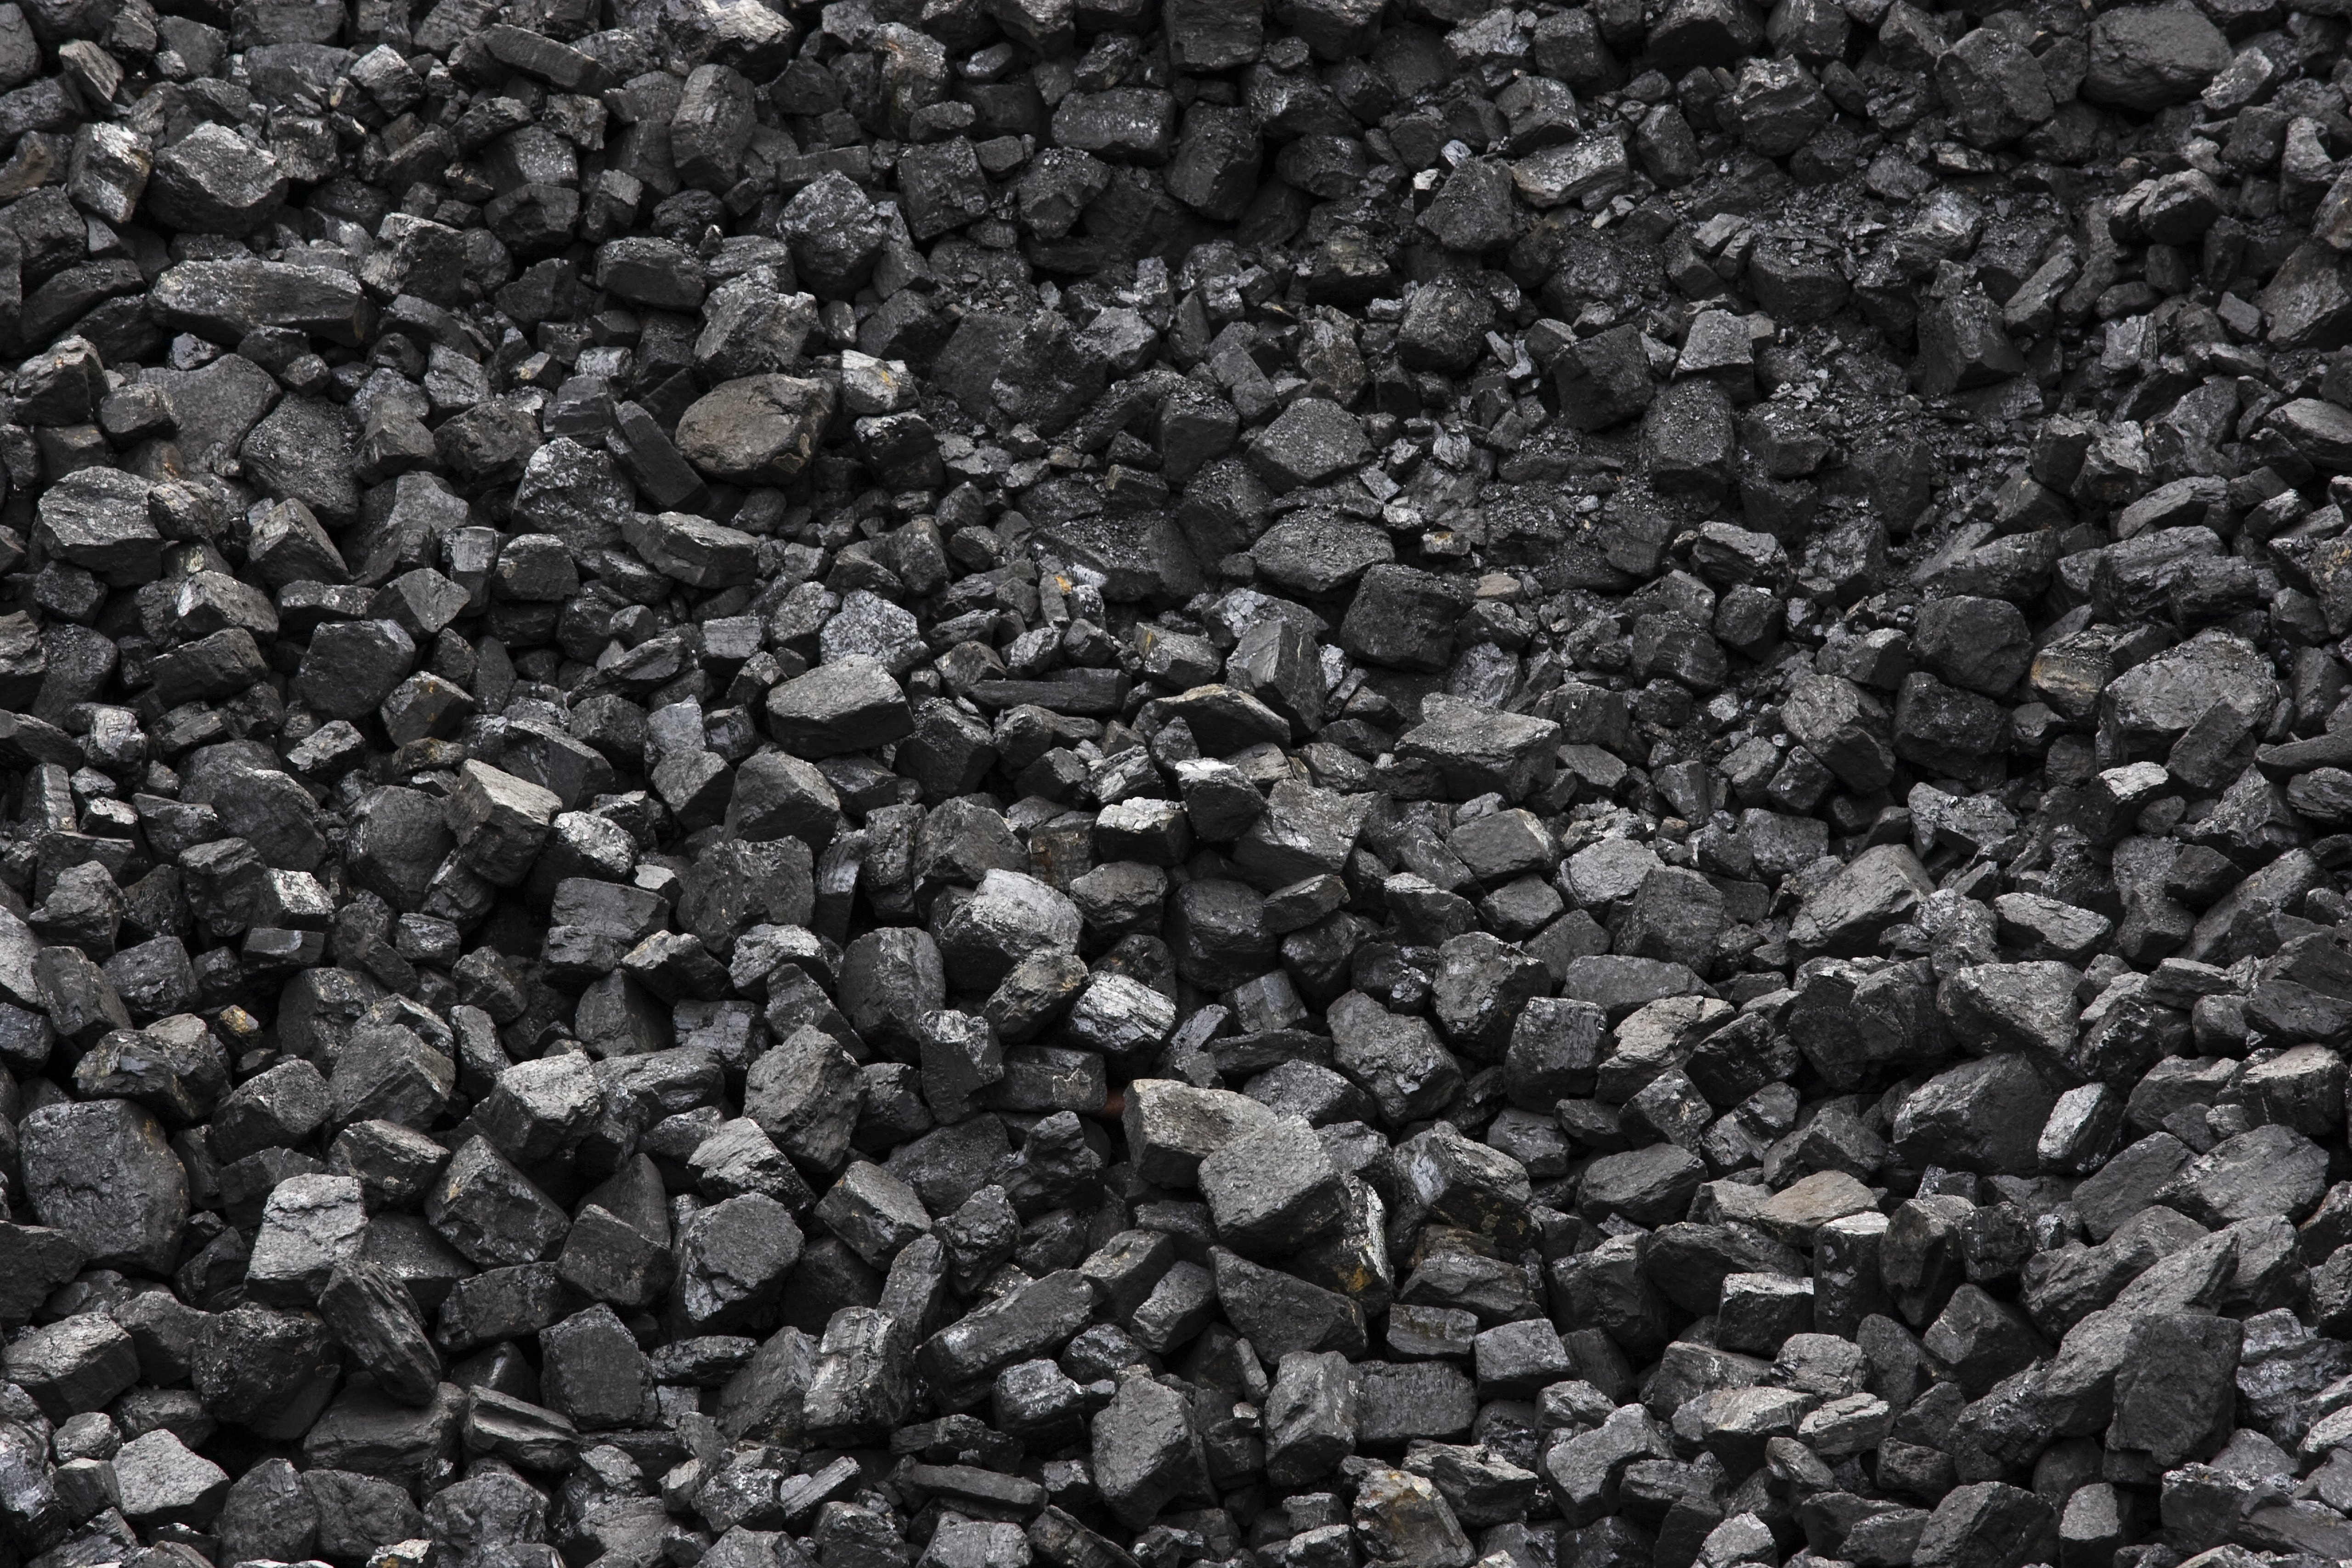 Coal, Gloucestershire, UK